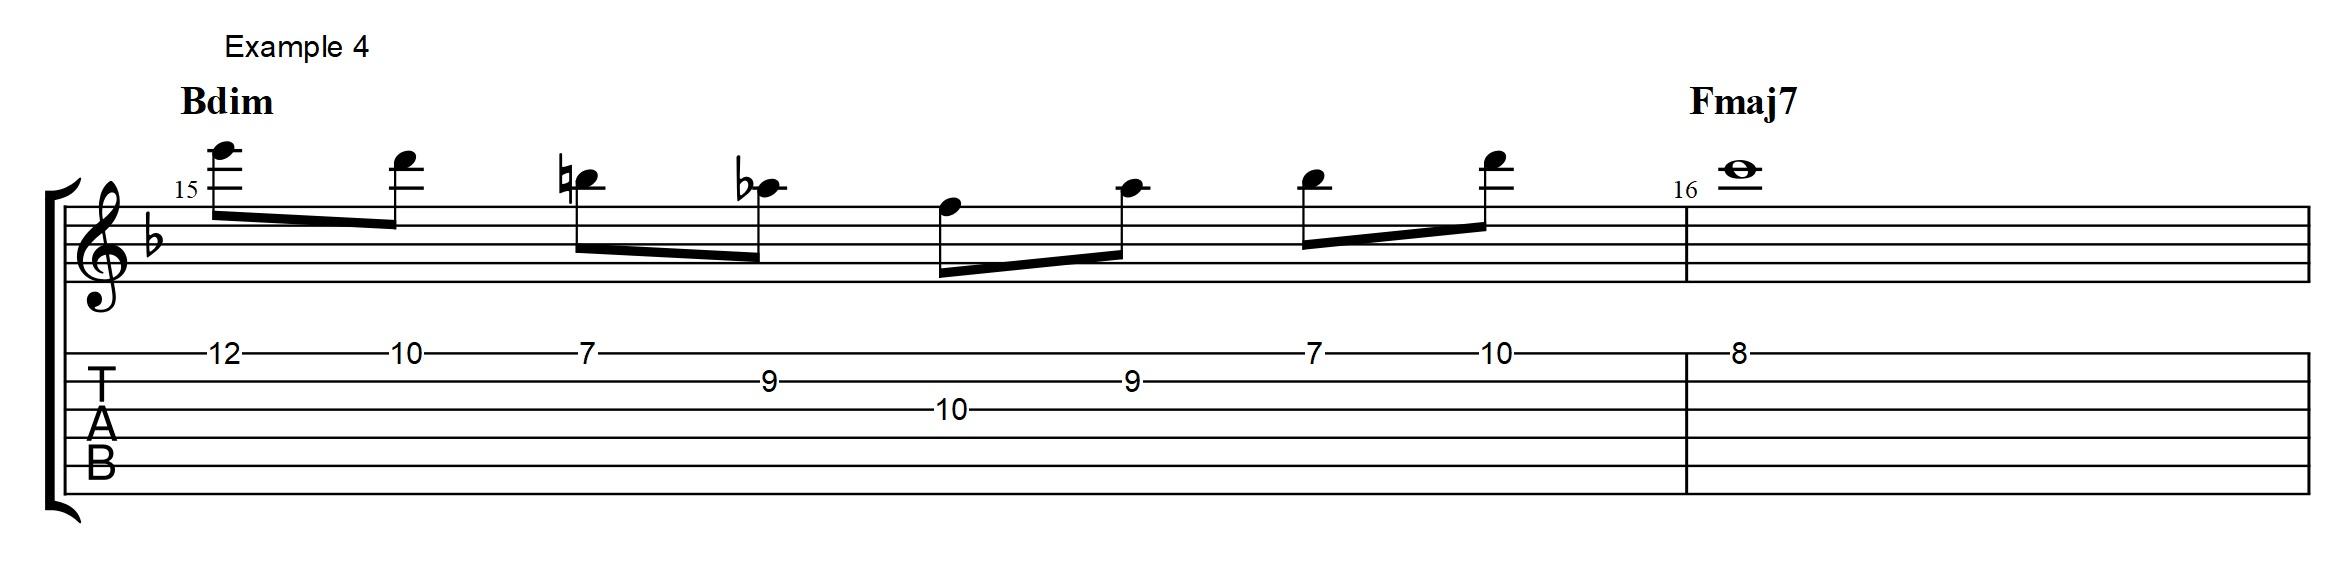 Diminished Chord Harmony Archives Jens Larsen